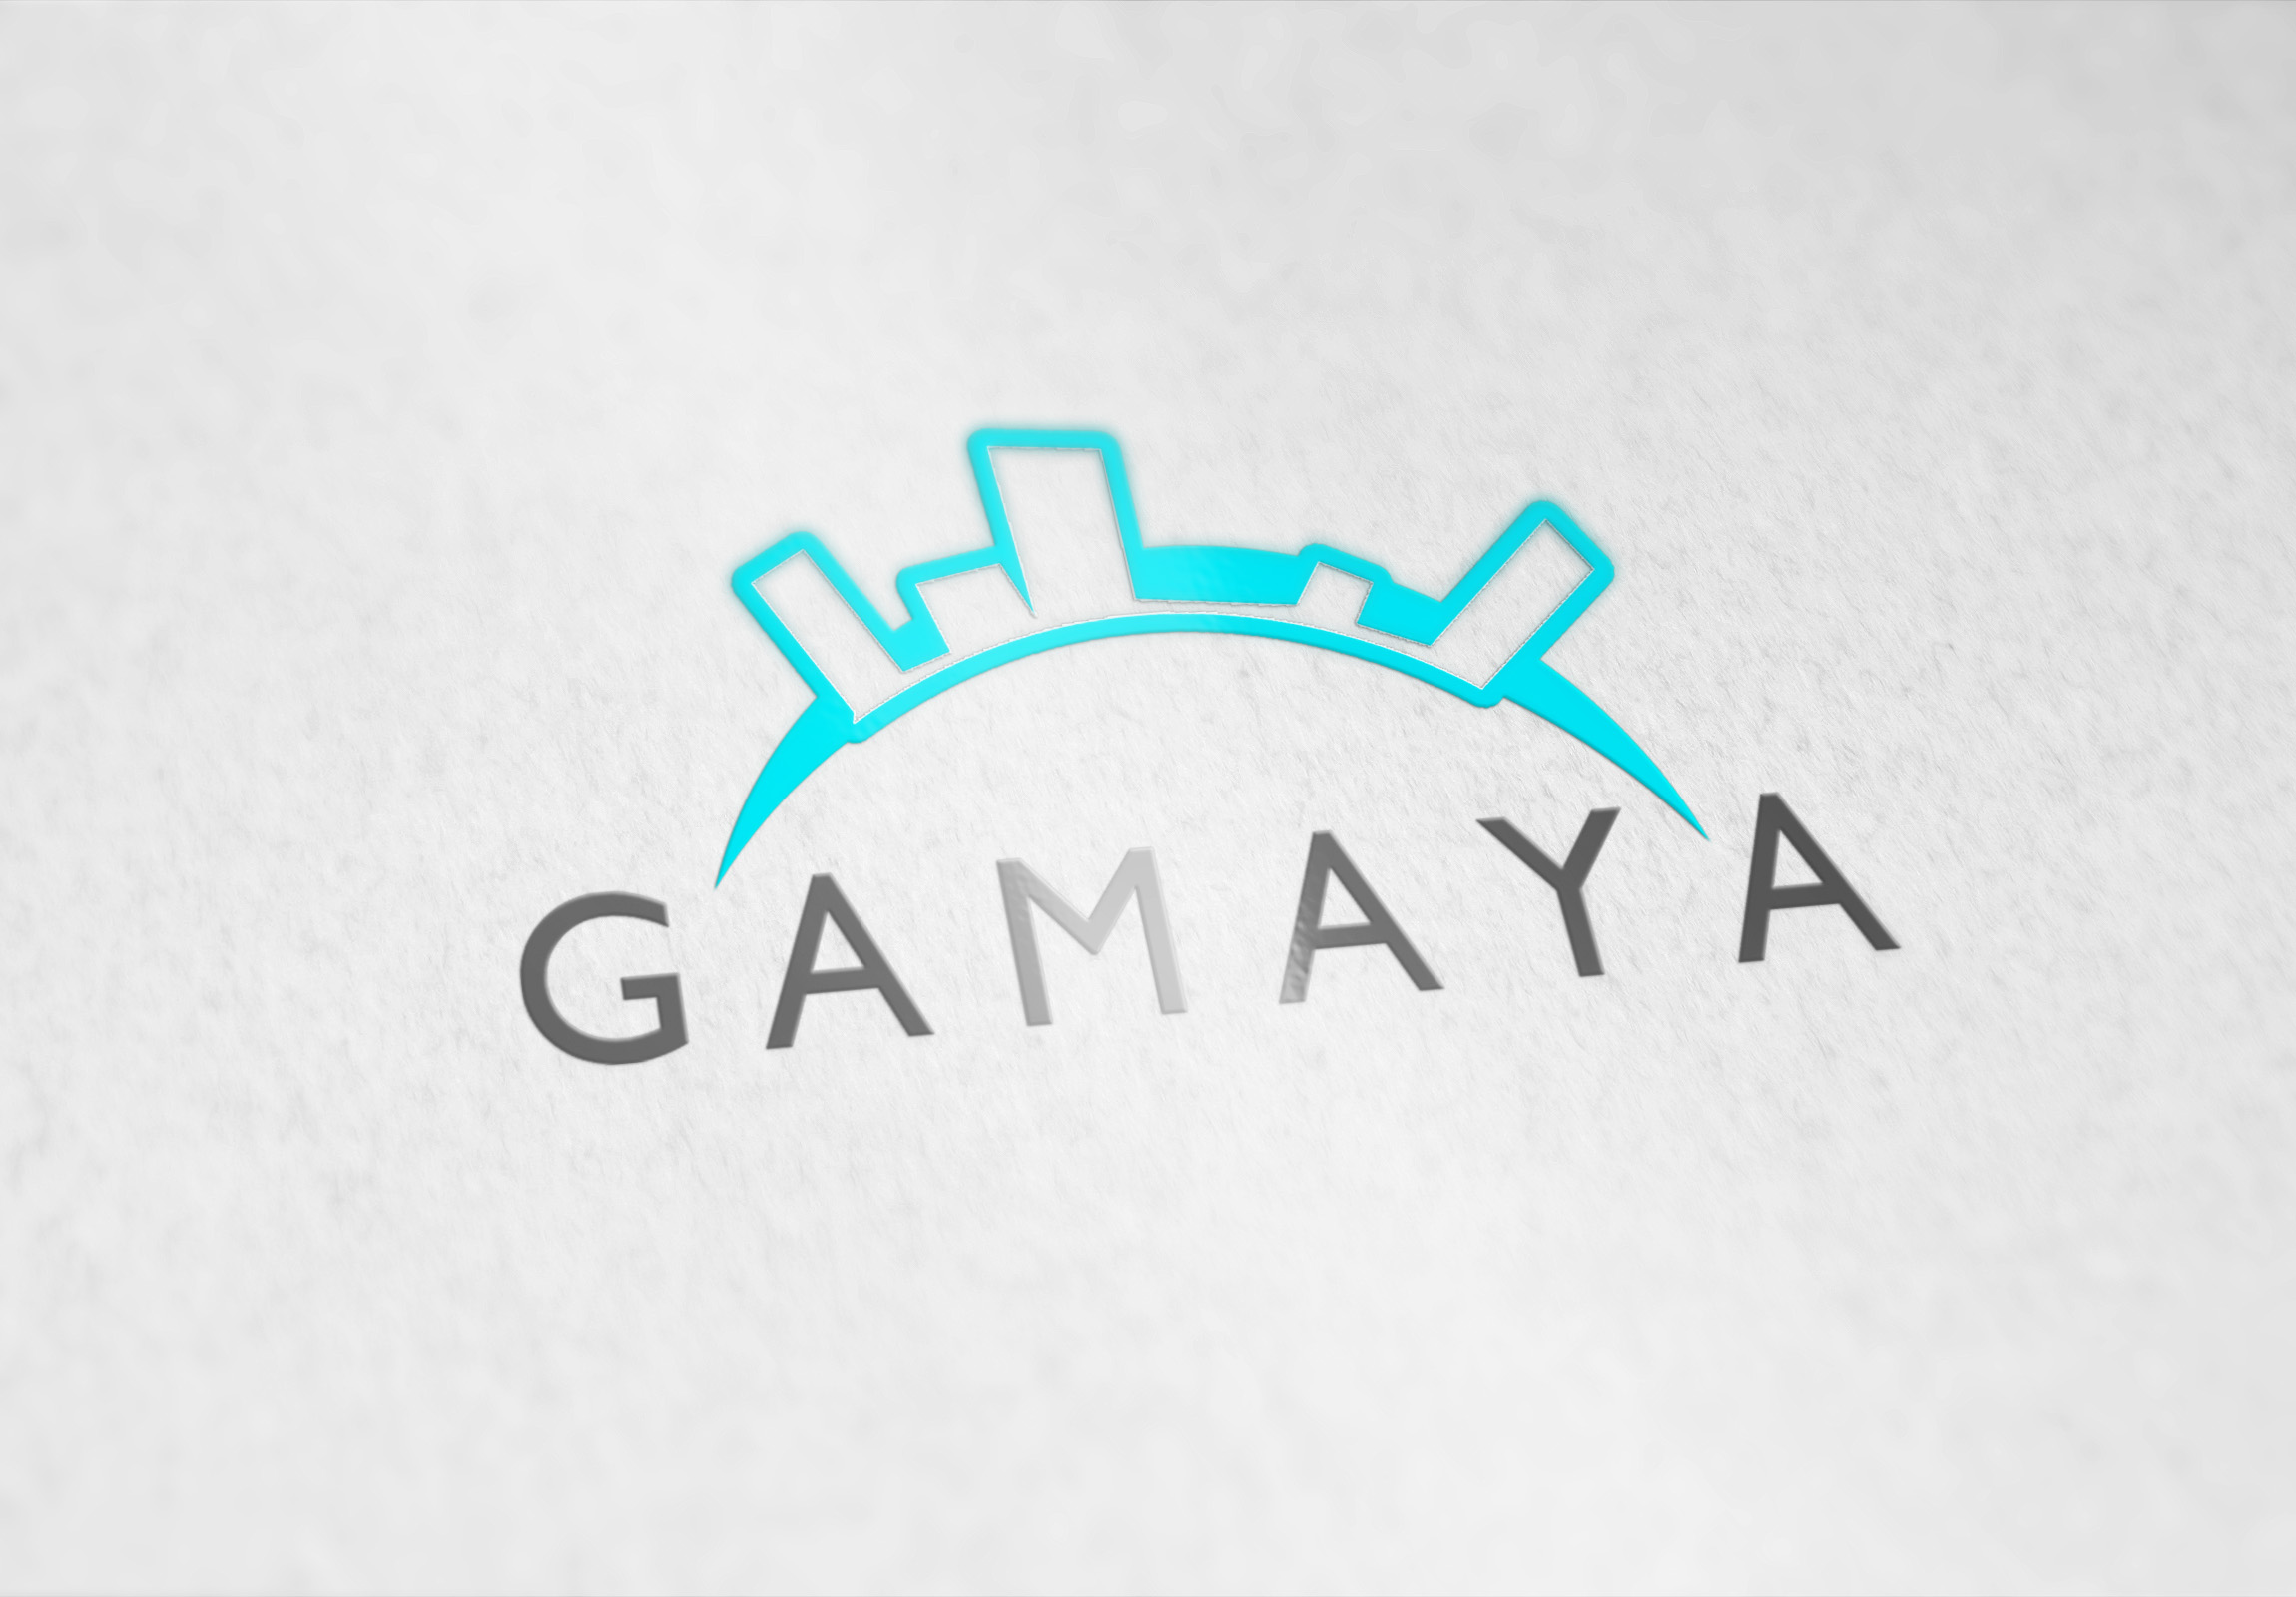 Разработка логотипа для компании Gamaya фото f_825548116741fe36.jpg